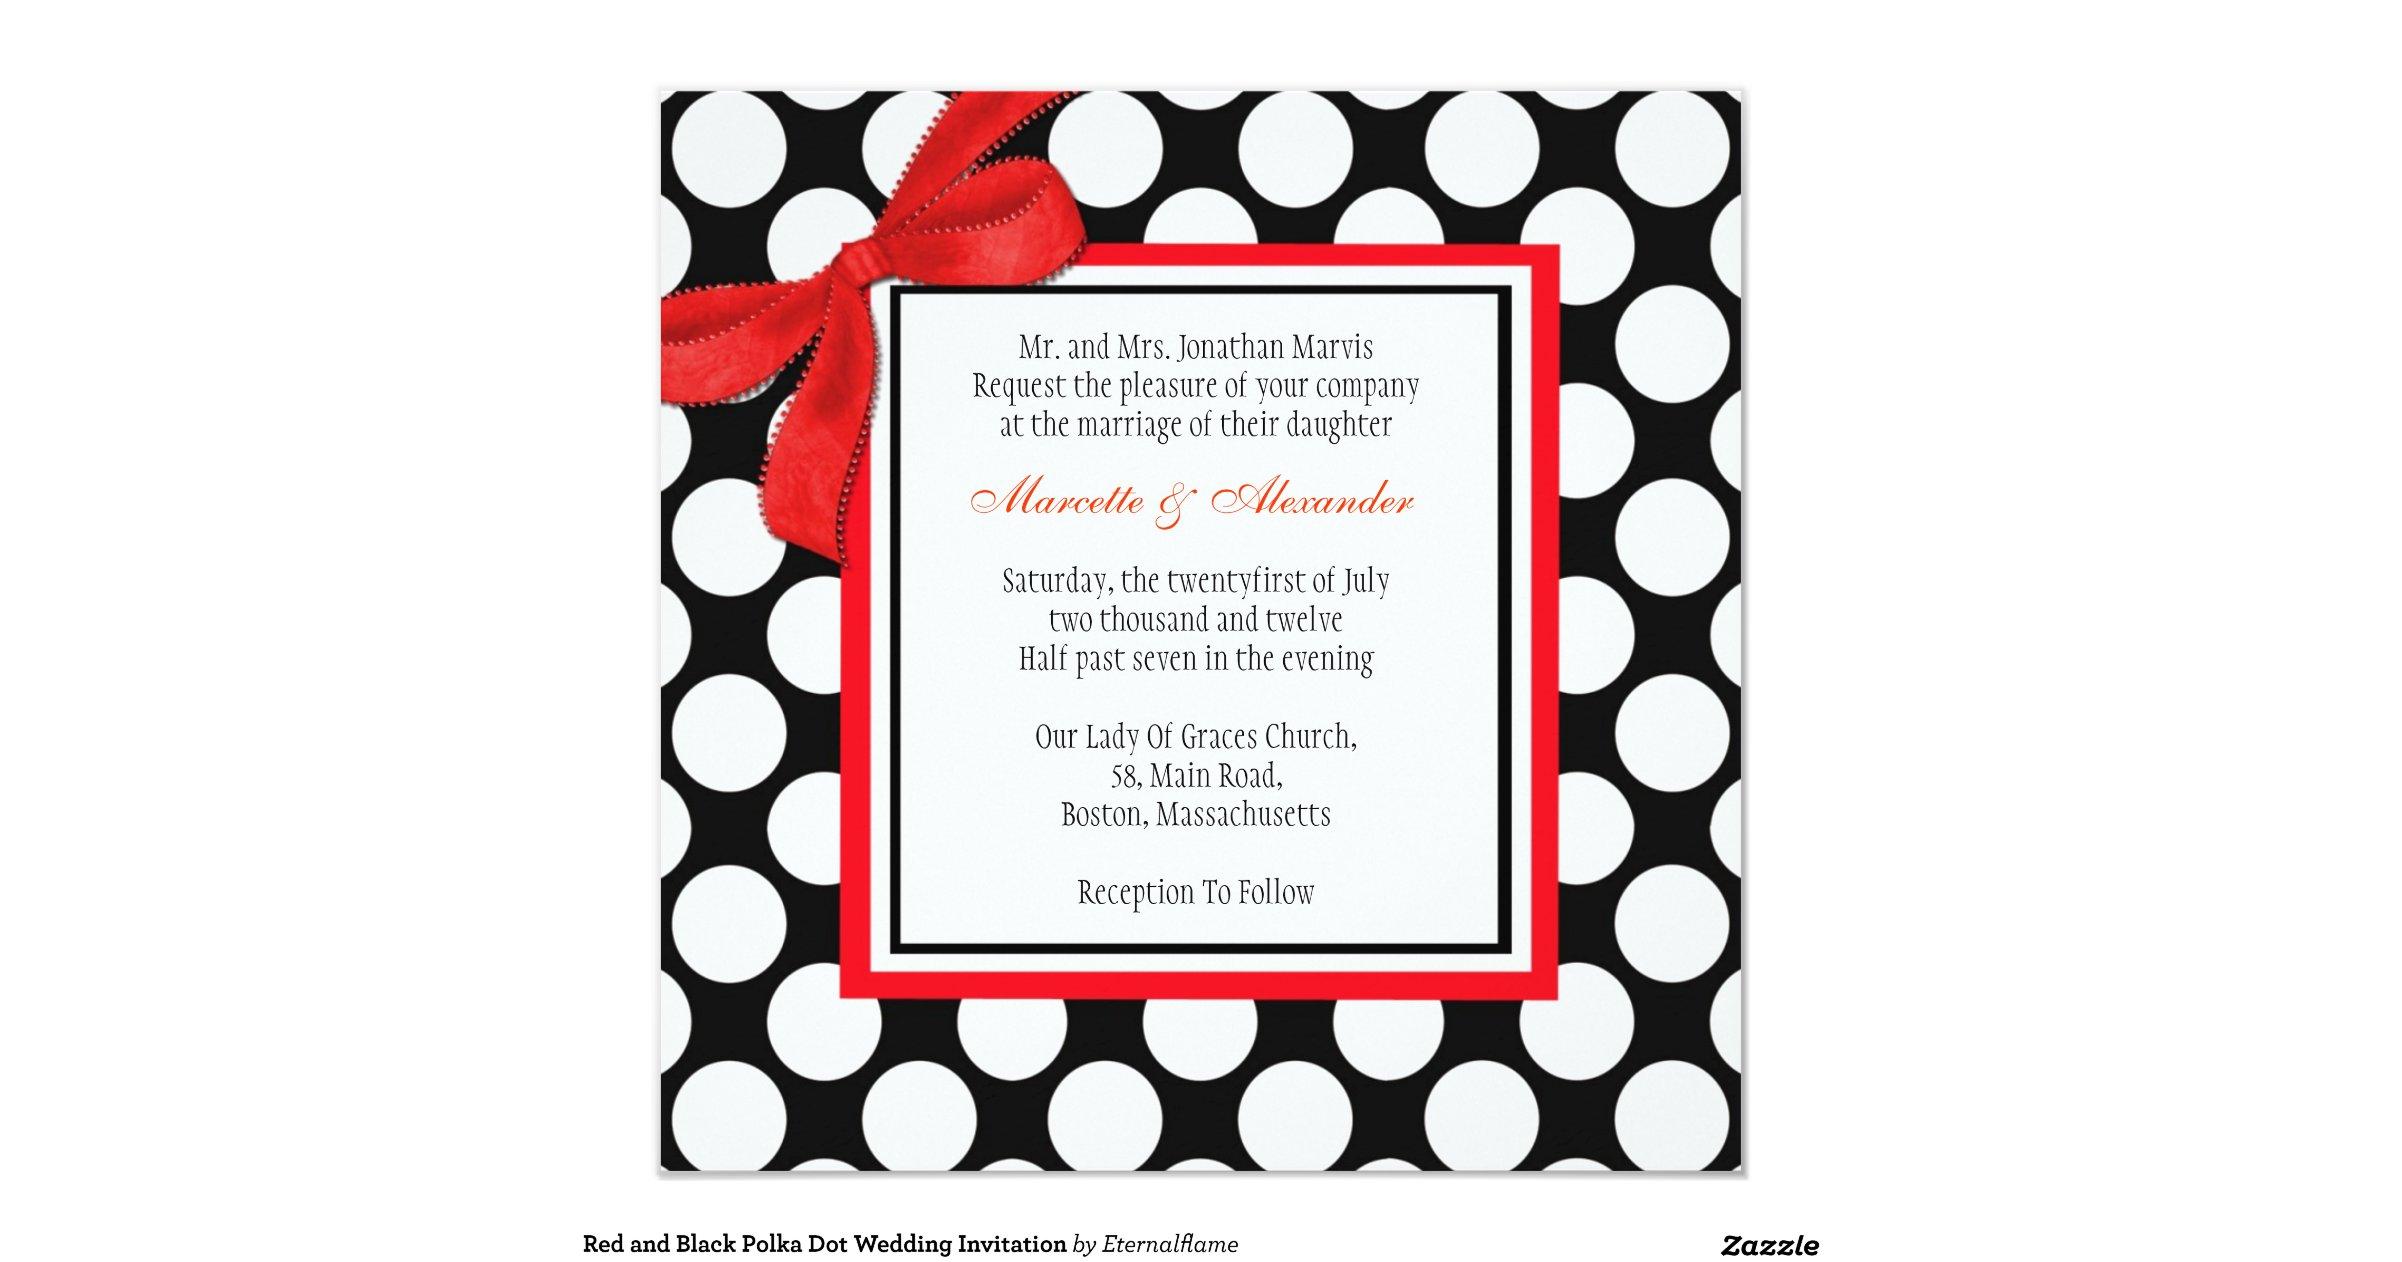 Wedding Invitations Red And Black: Red_and_black_polka_dot_wedding_invitation